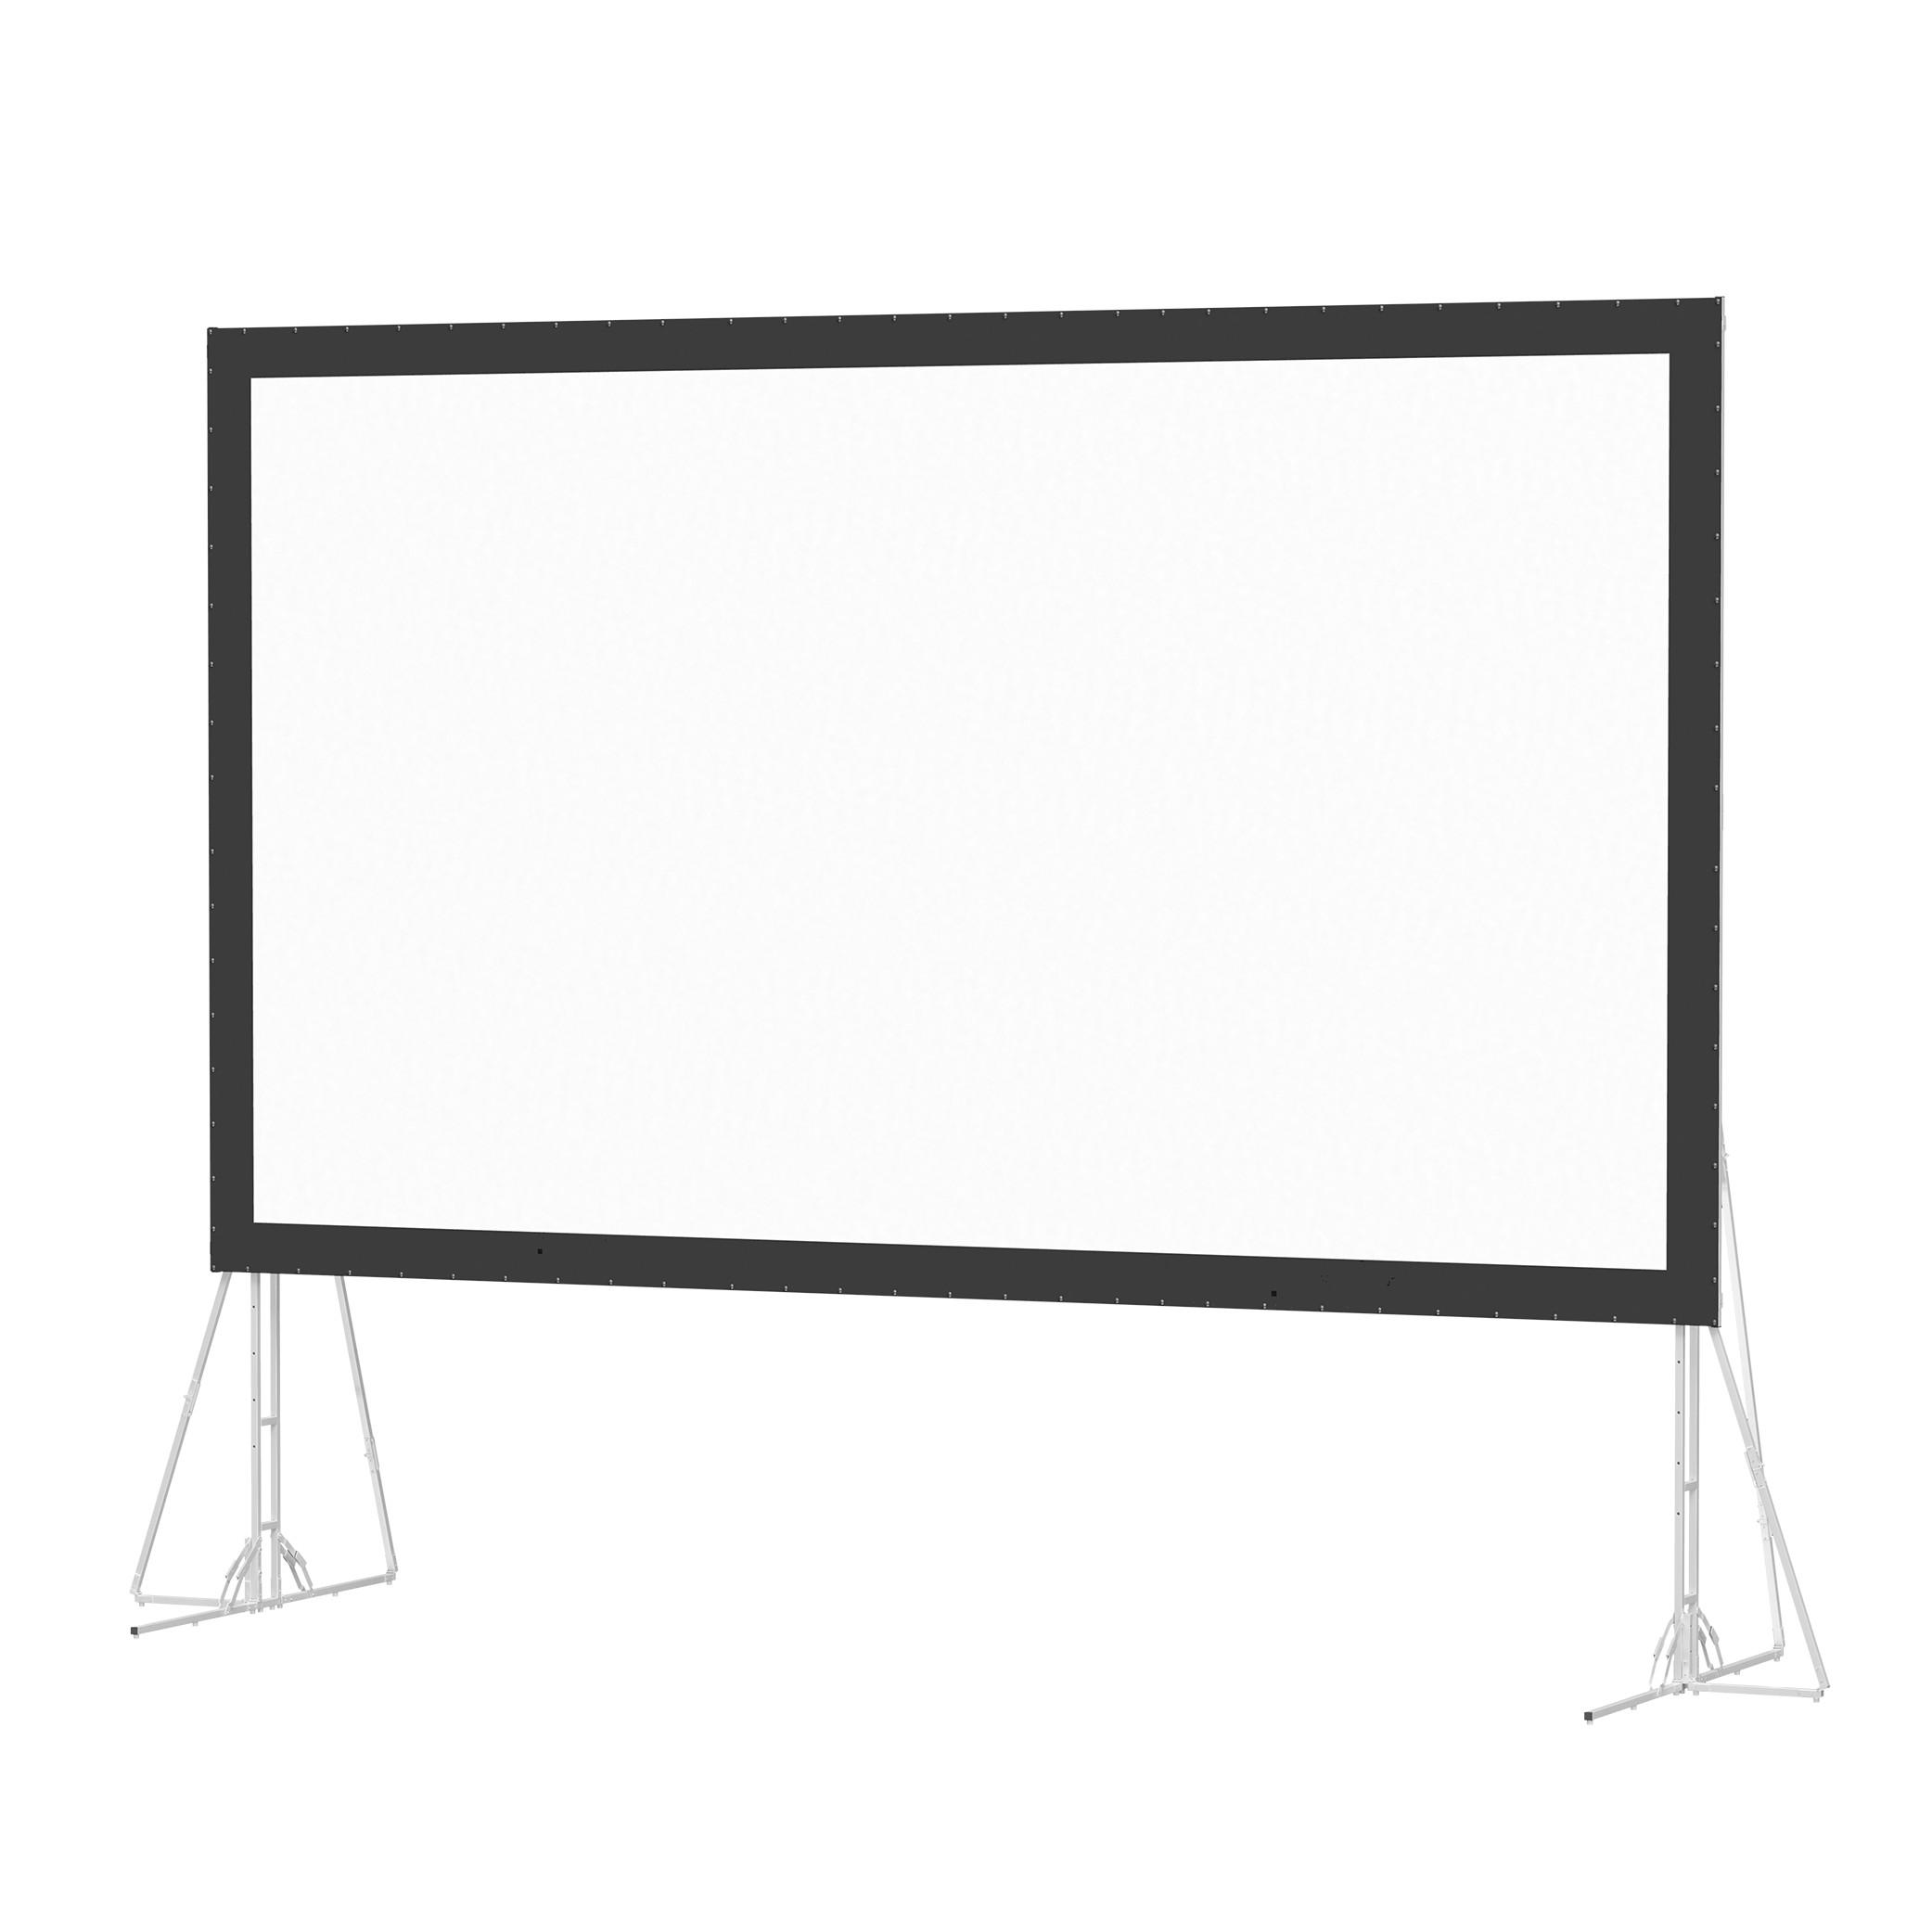 8-6X14-4 Fast-Fold Truss Frame Projection Screen in Da-Mat